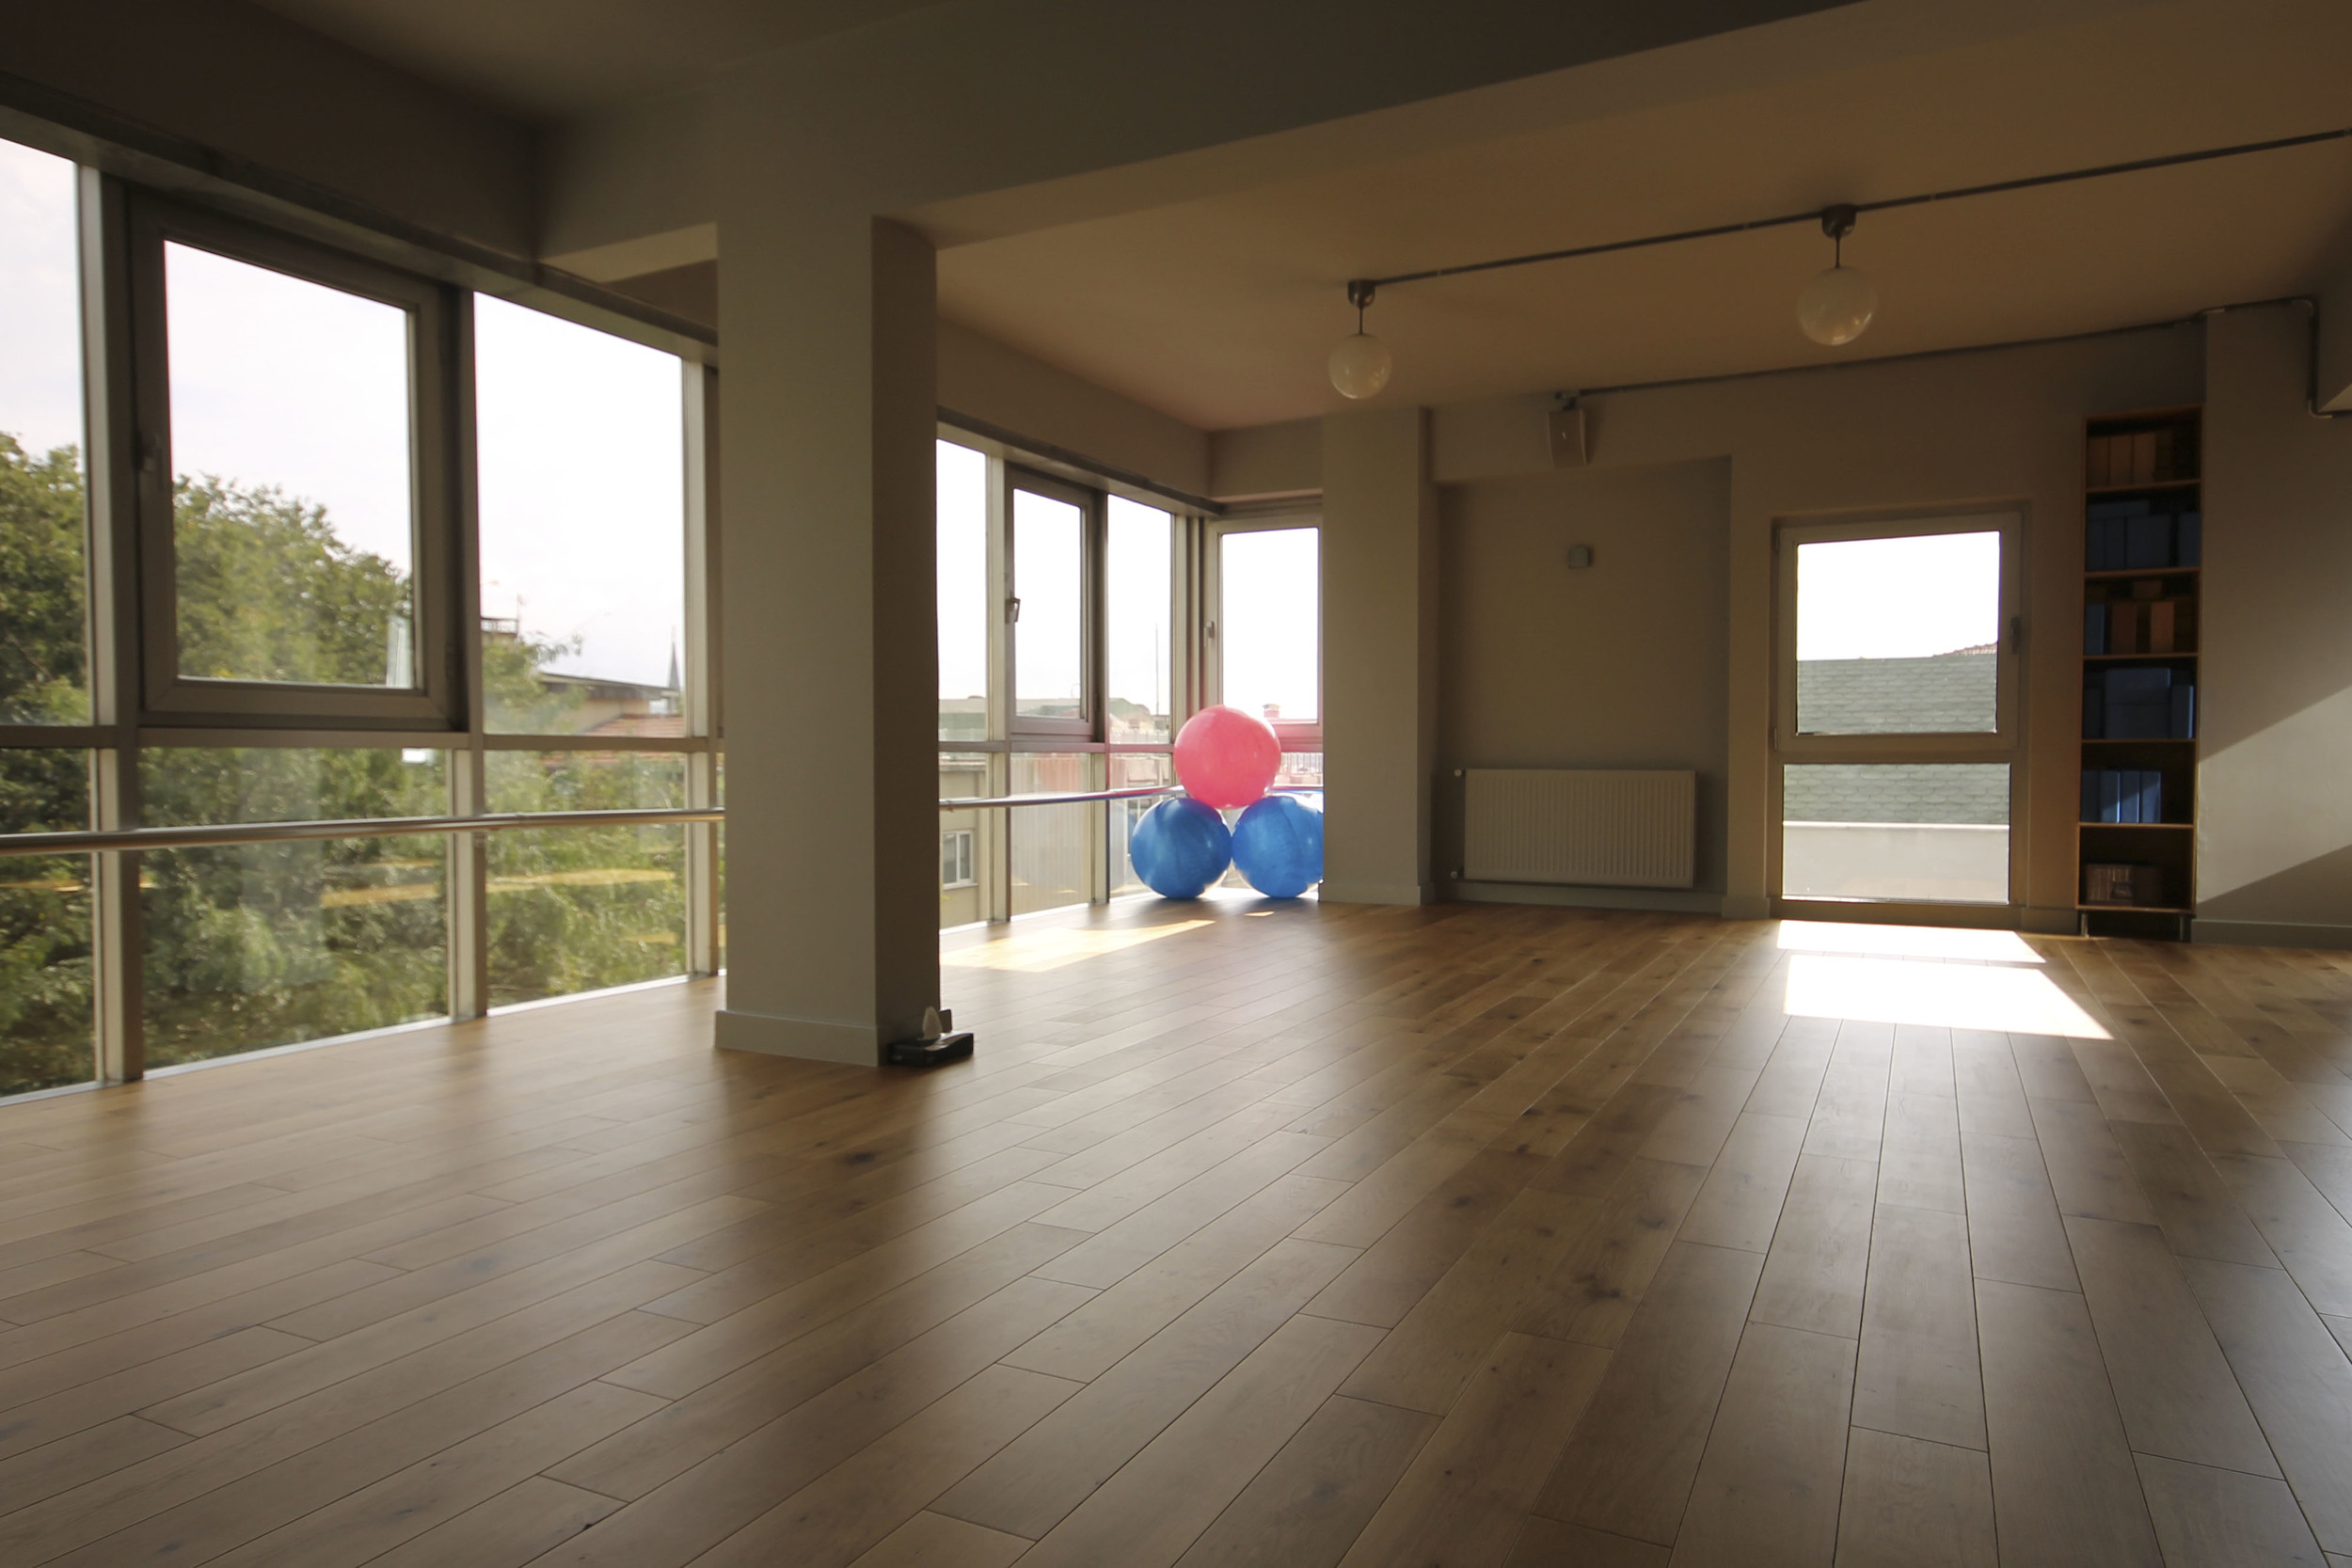 cihangir yoga studio istanbul cihangir2962.jpg